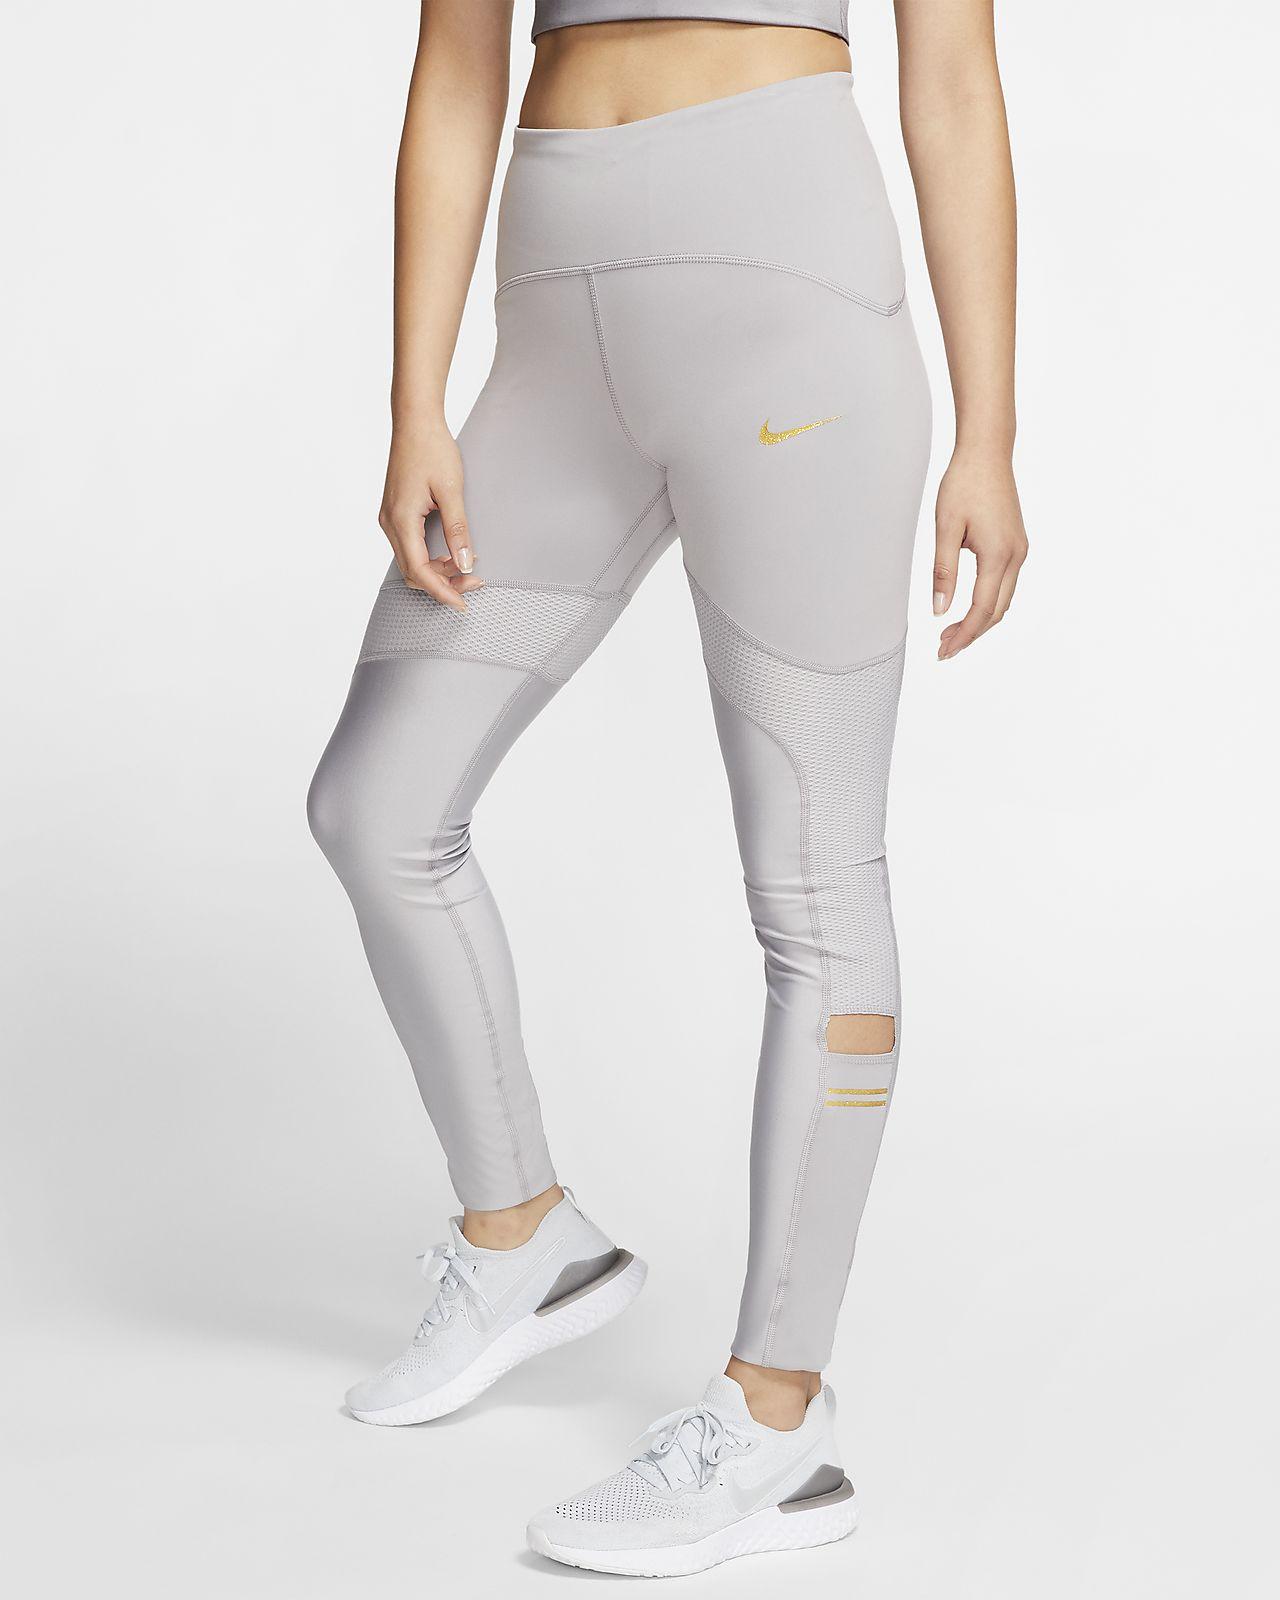 Nike Speed női sportnadrág | Női fitnesznadrágok | Fitnesz